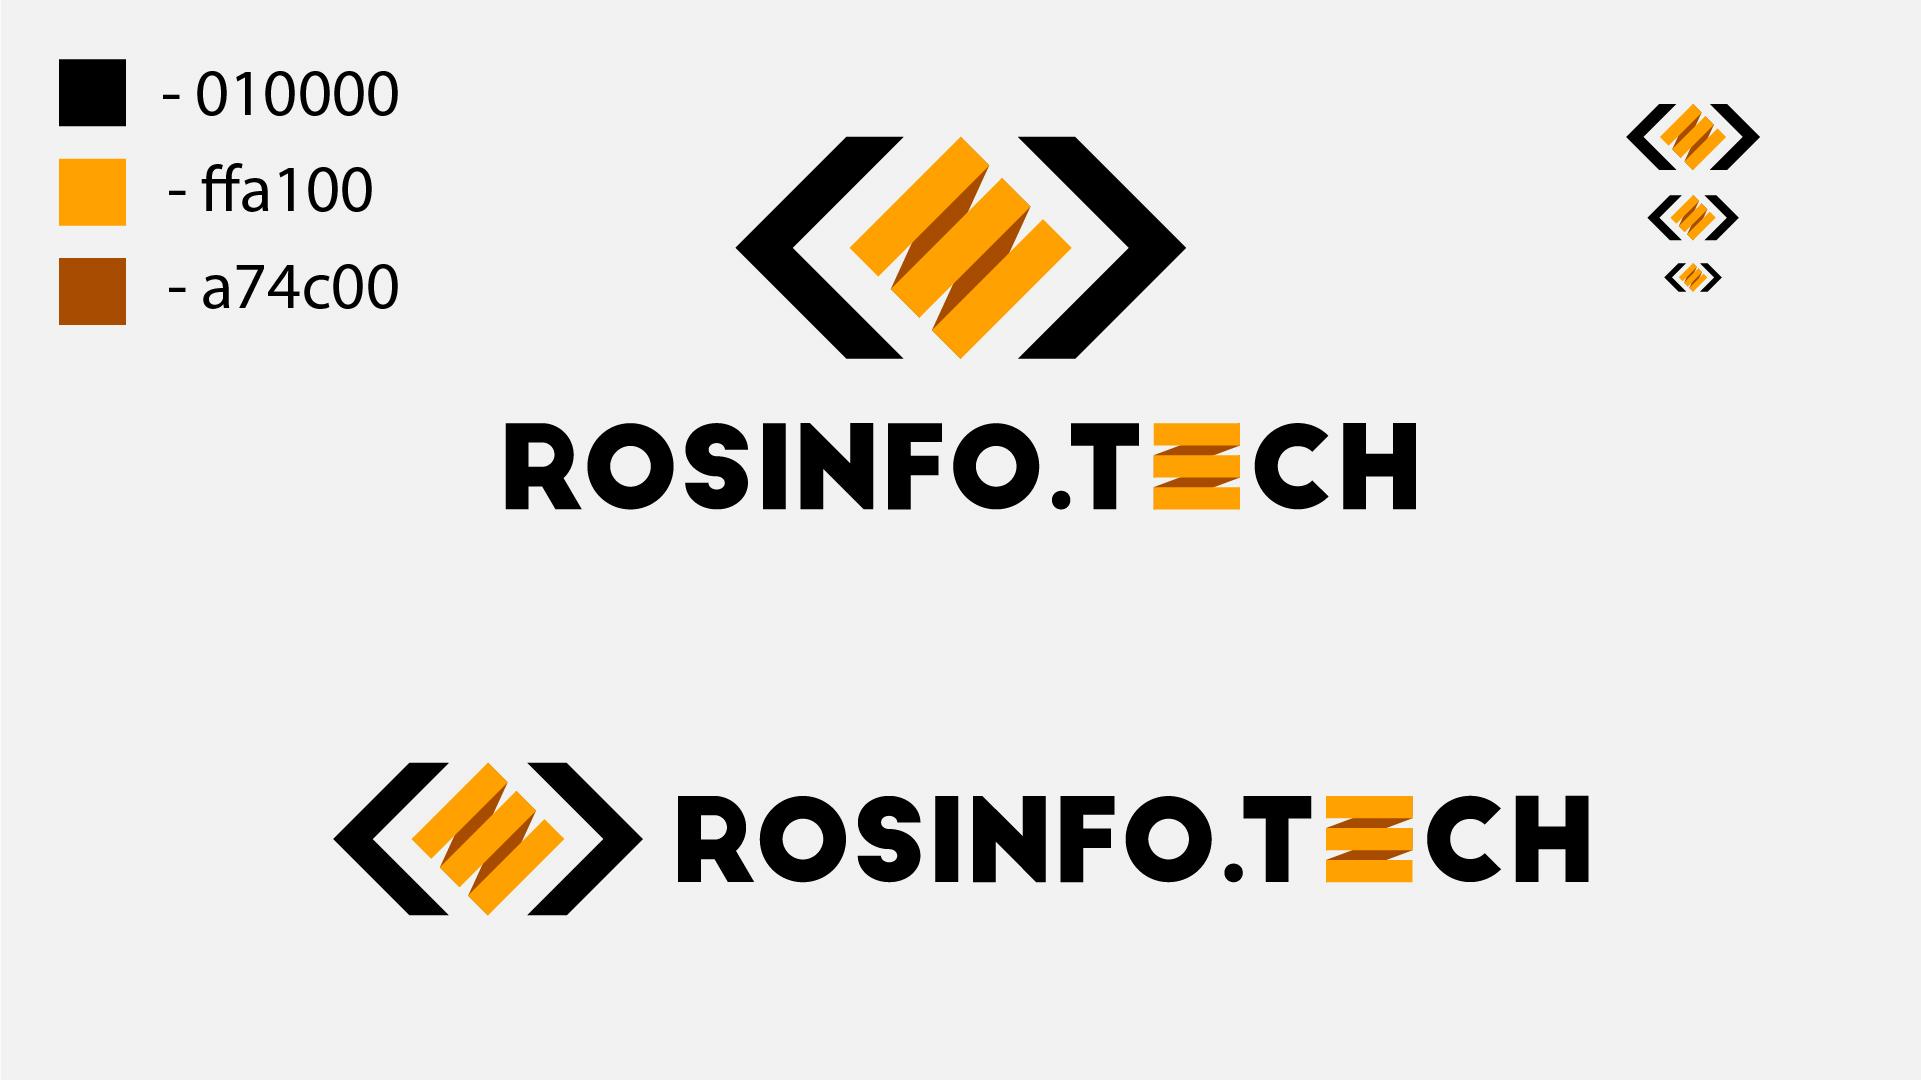 Разработка пакета айдентики rosinfo.tech фото f_3695e1da34e2121a.jpg